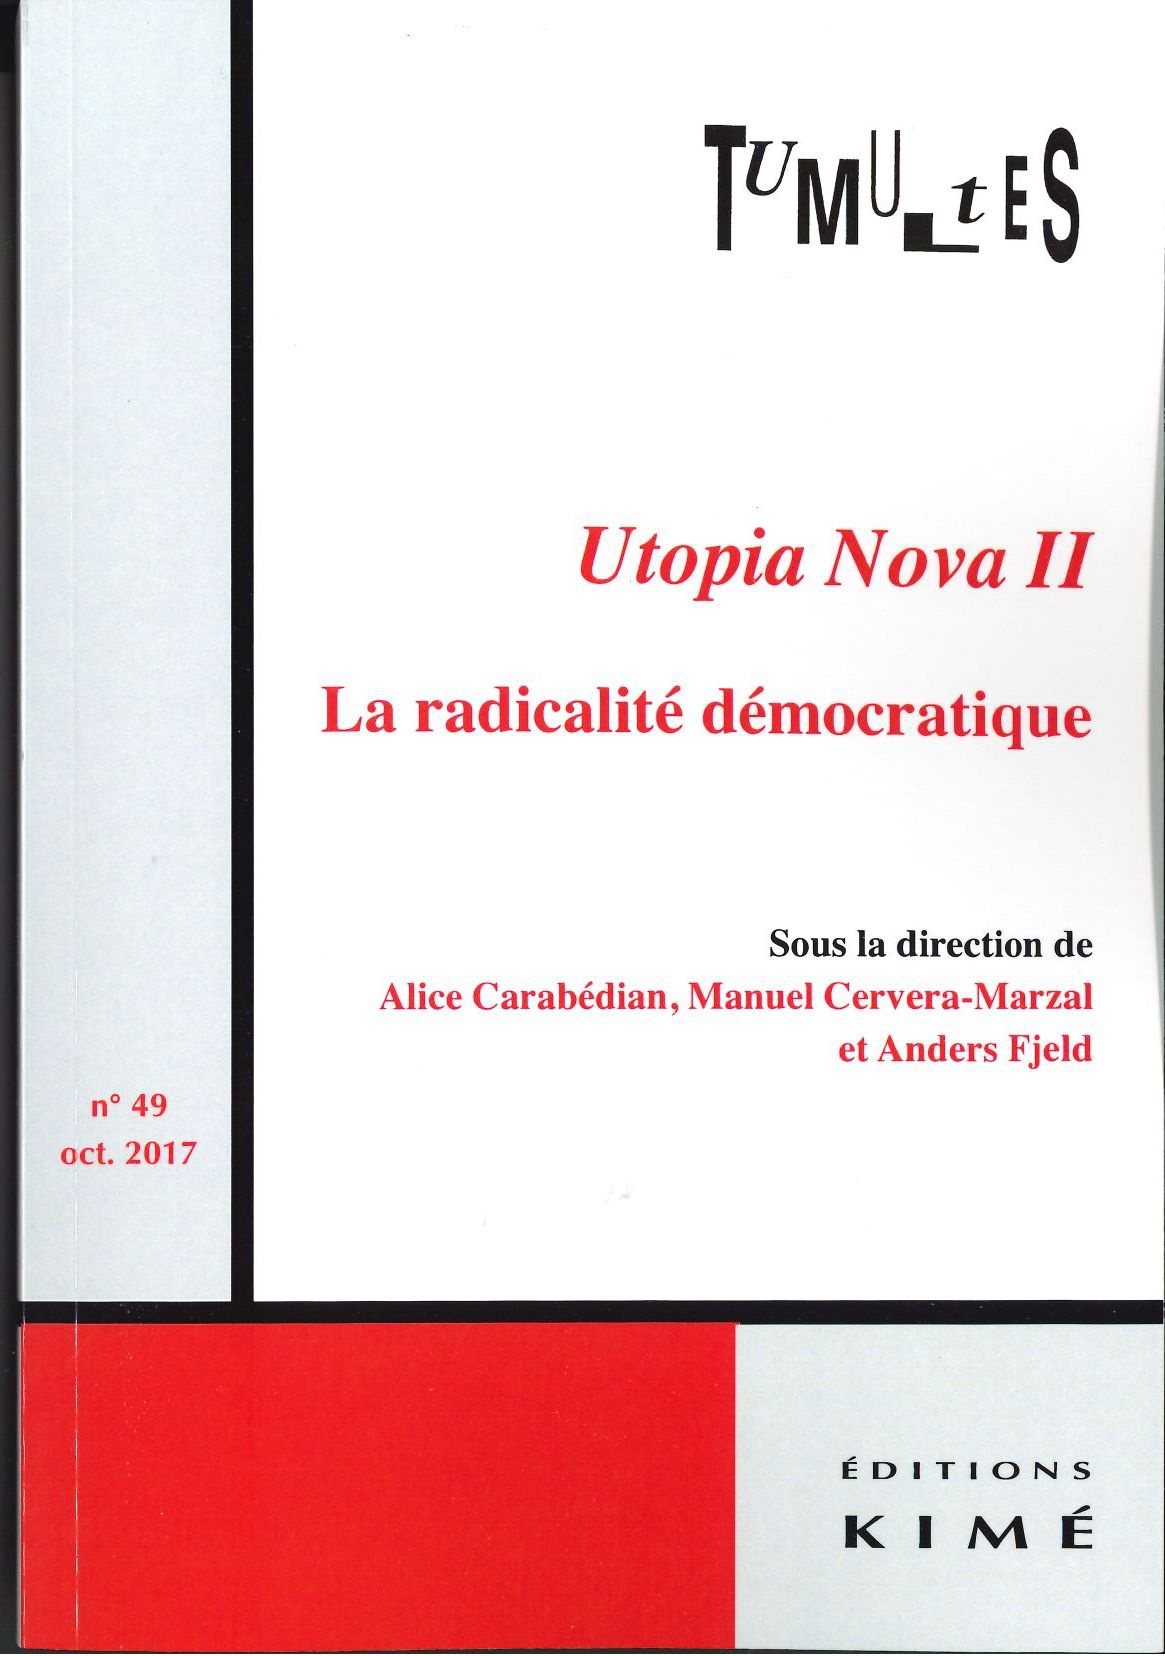 dissertation la constitution de 1793 une utopie démocratique